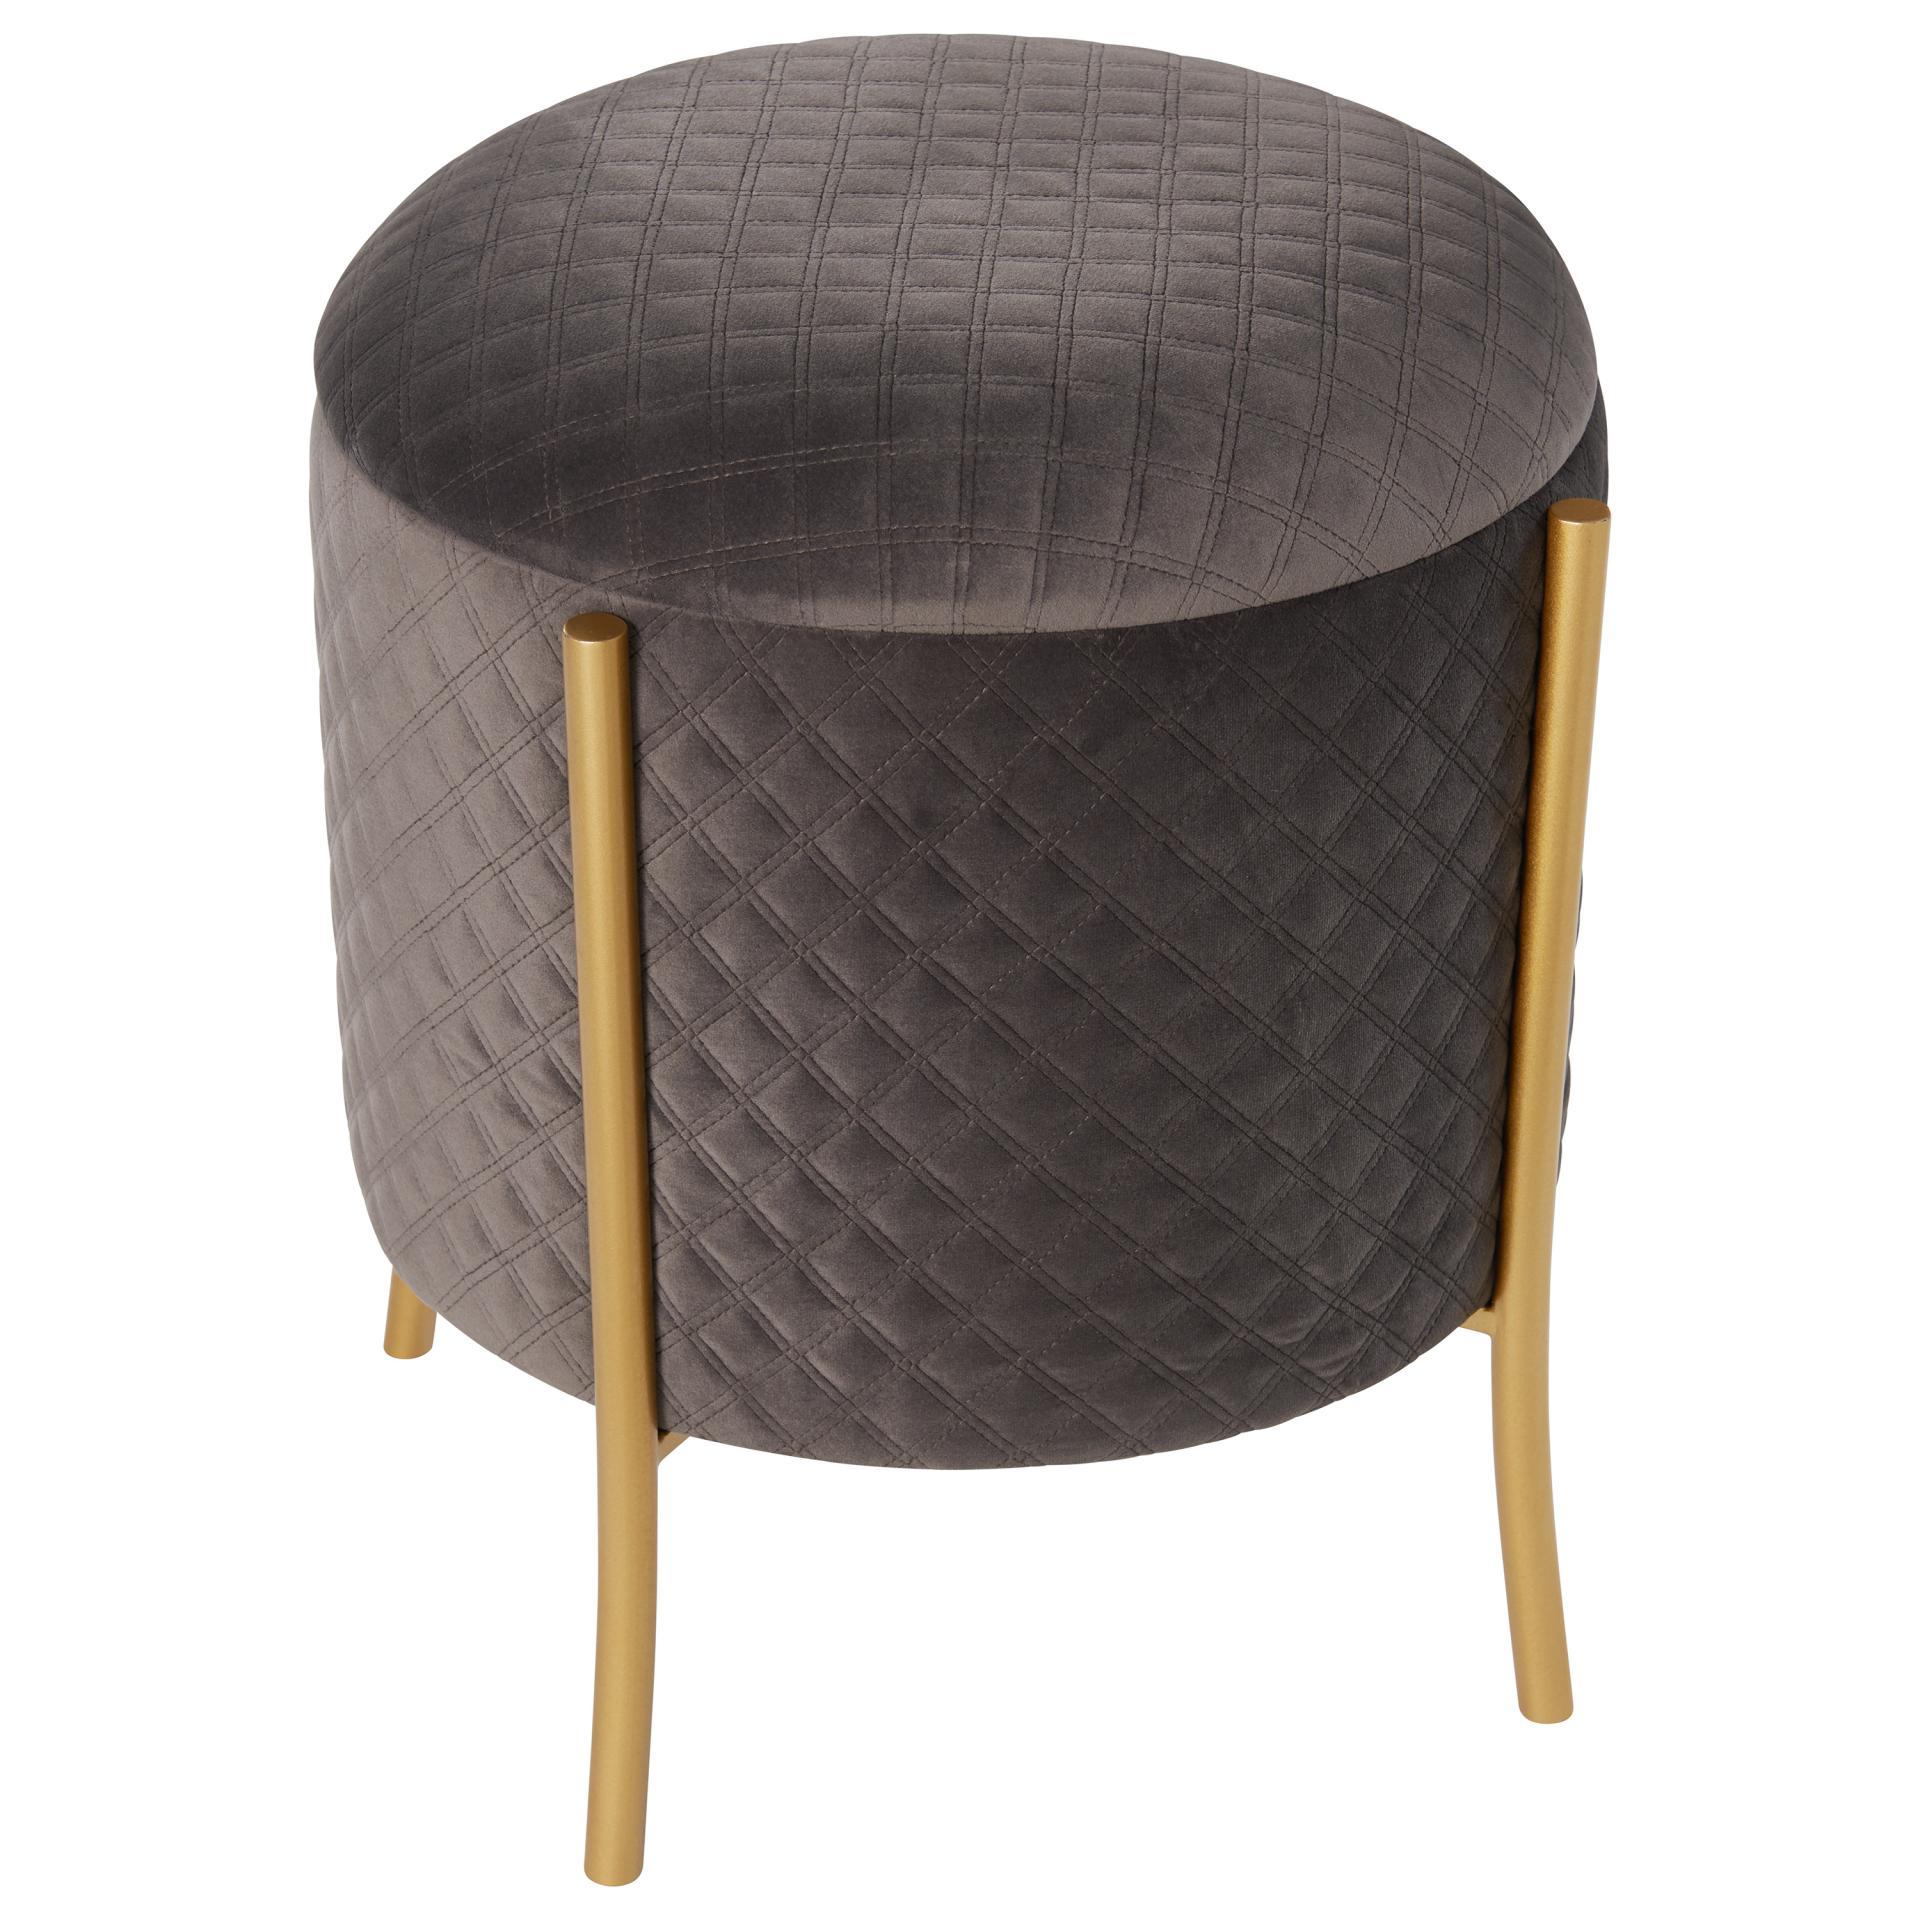 1600058 313 Npd Home Furniture Wholesale Lifestyle